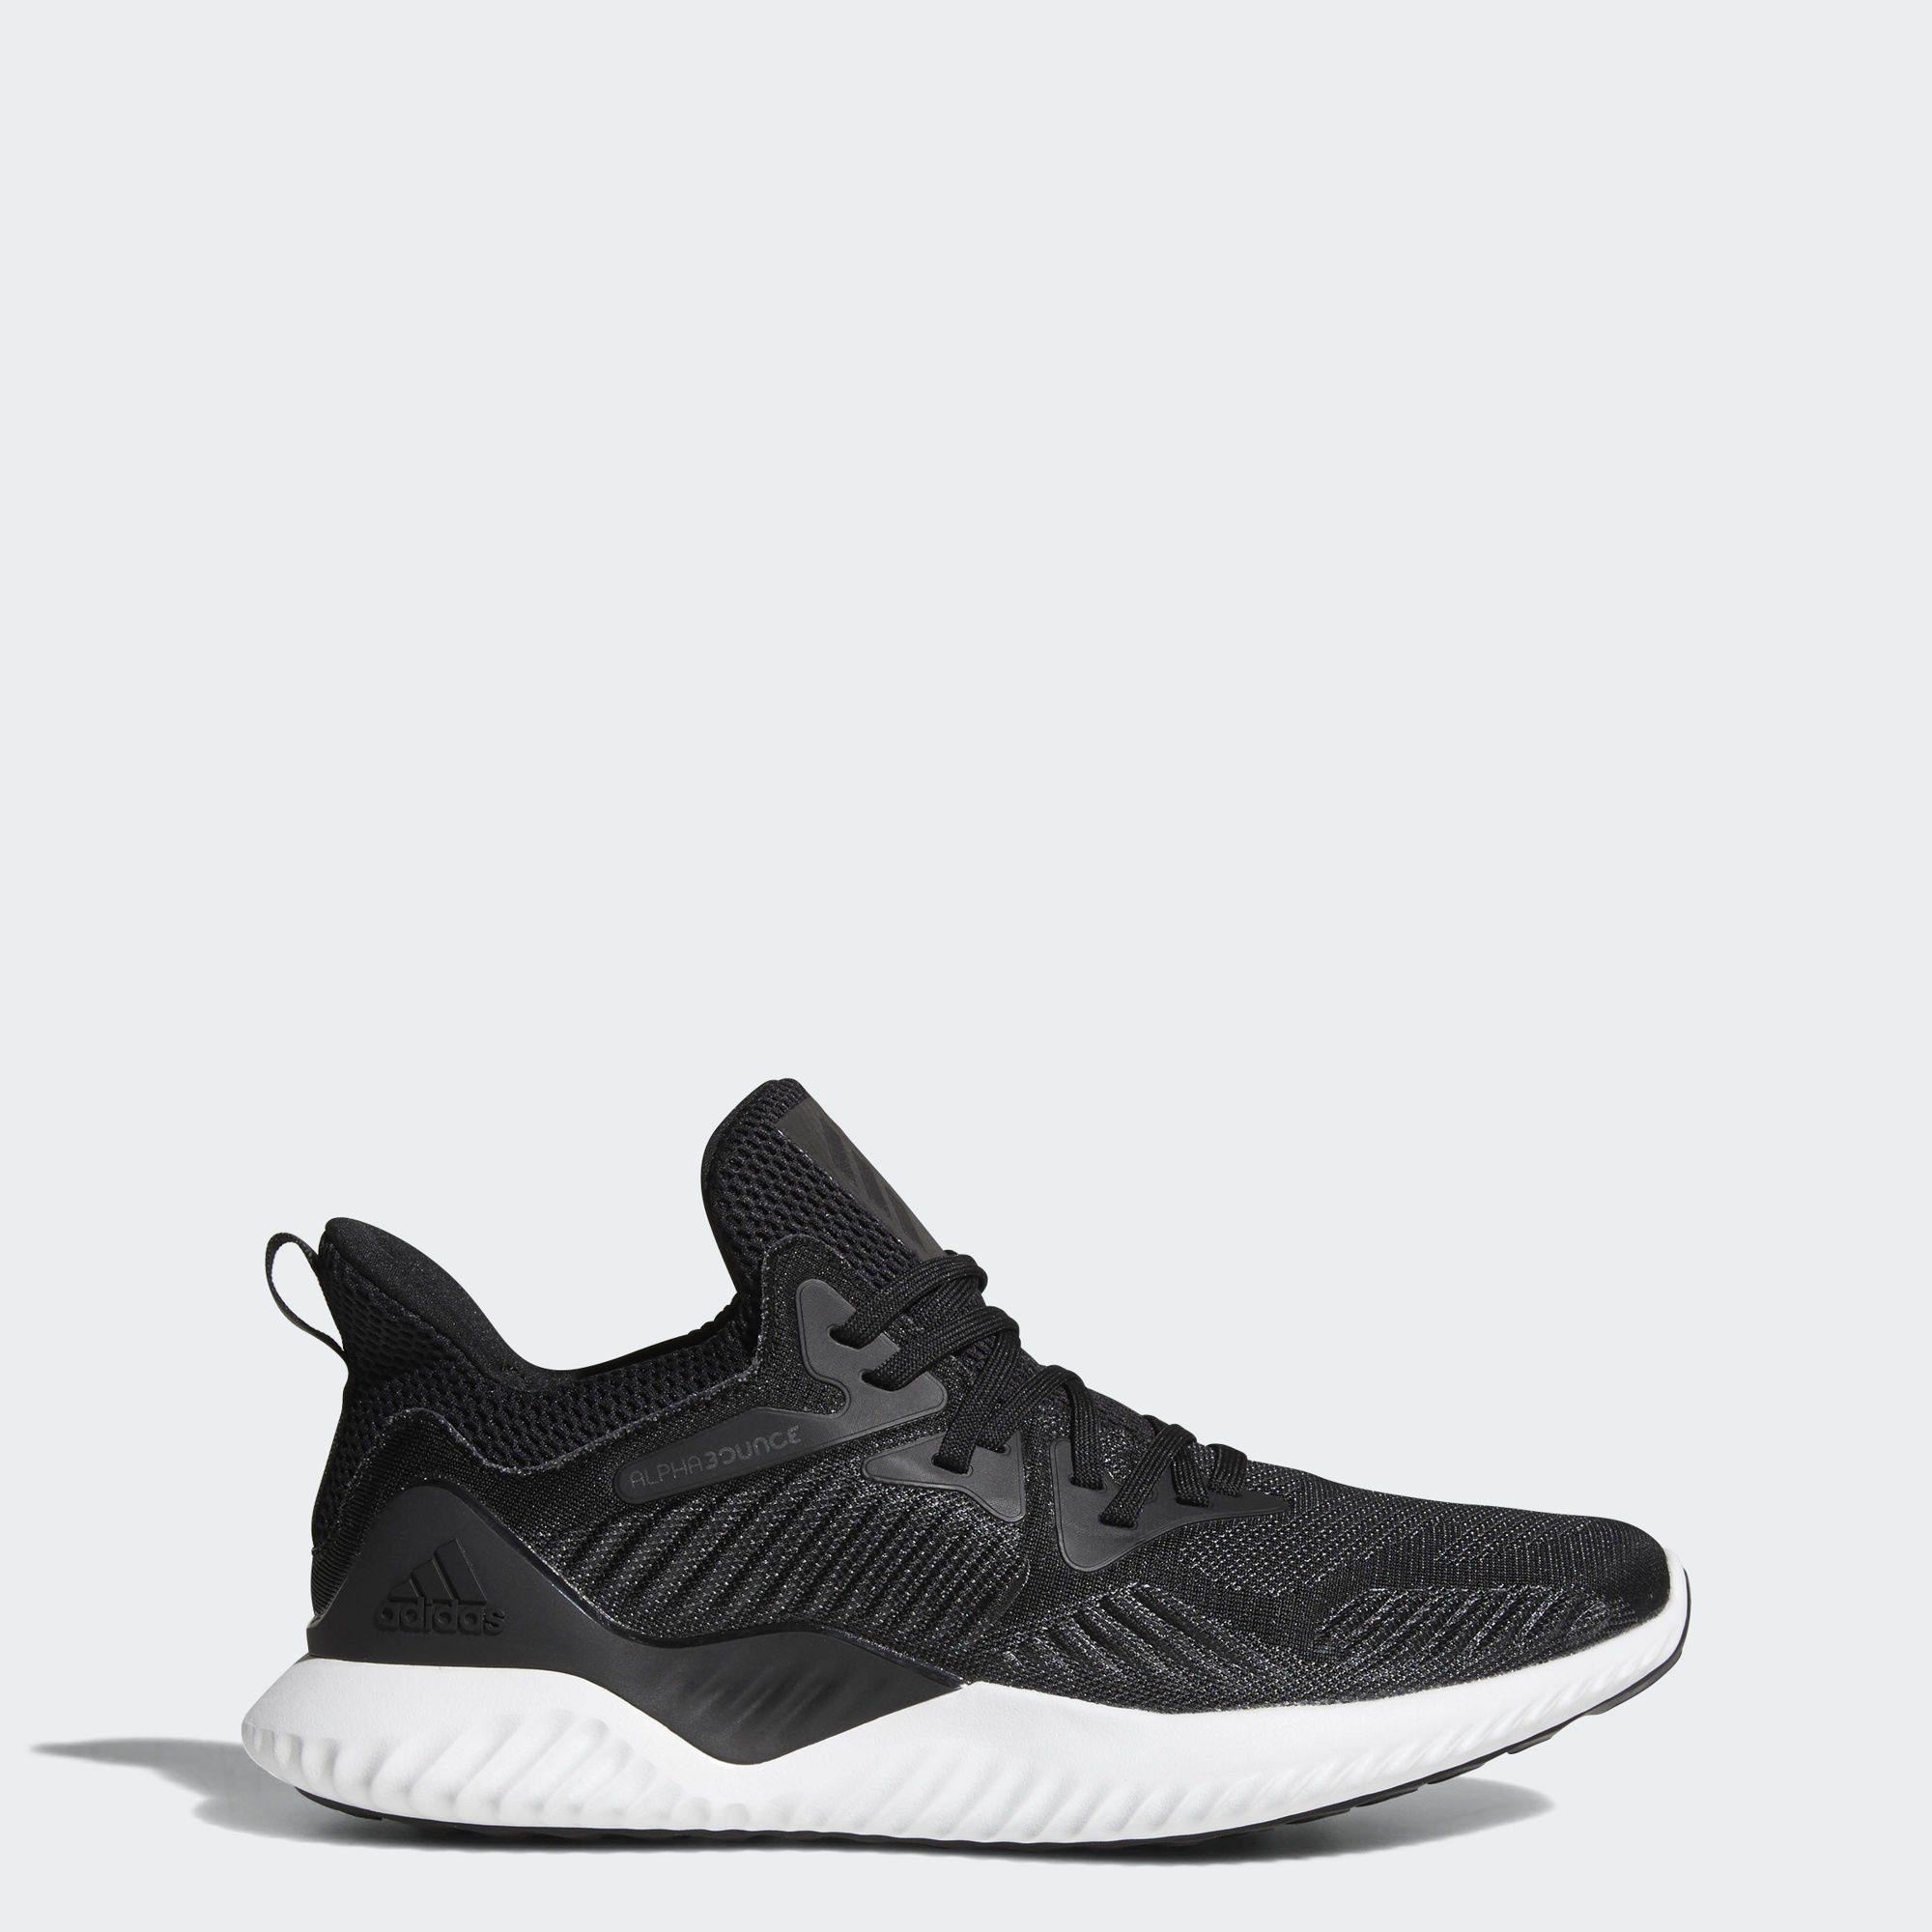 adidas Performance Alphabounce Beyond Laufschuh  black